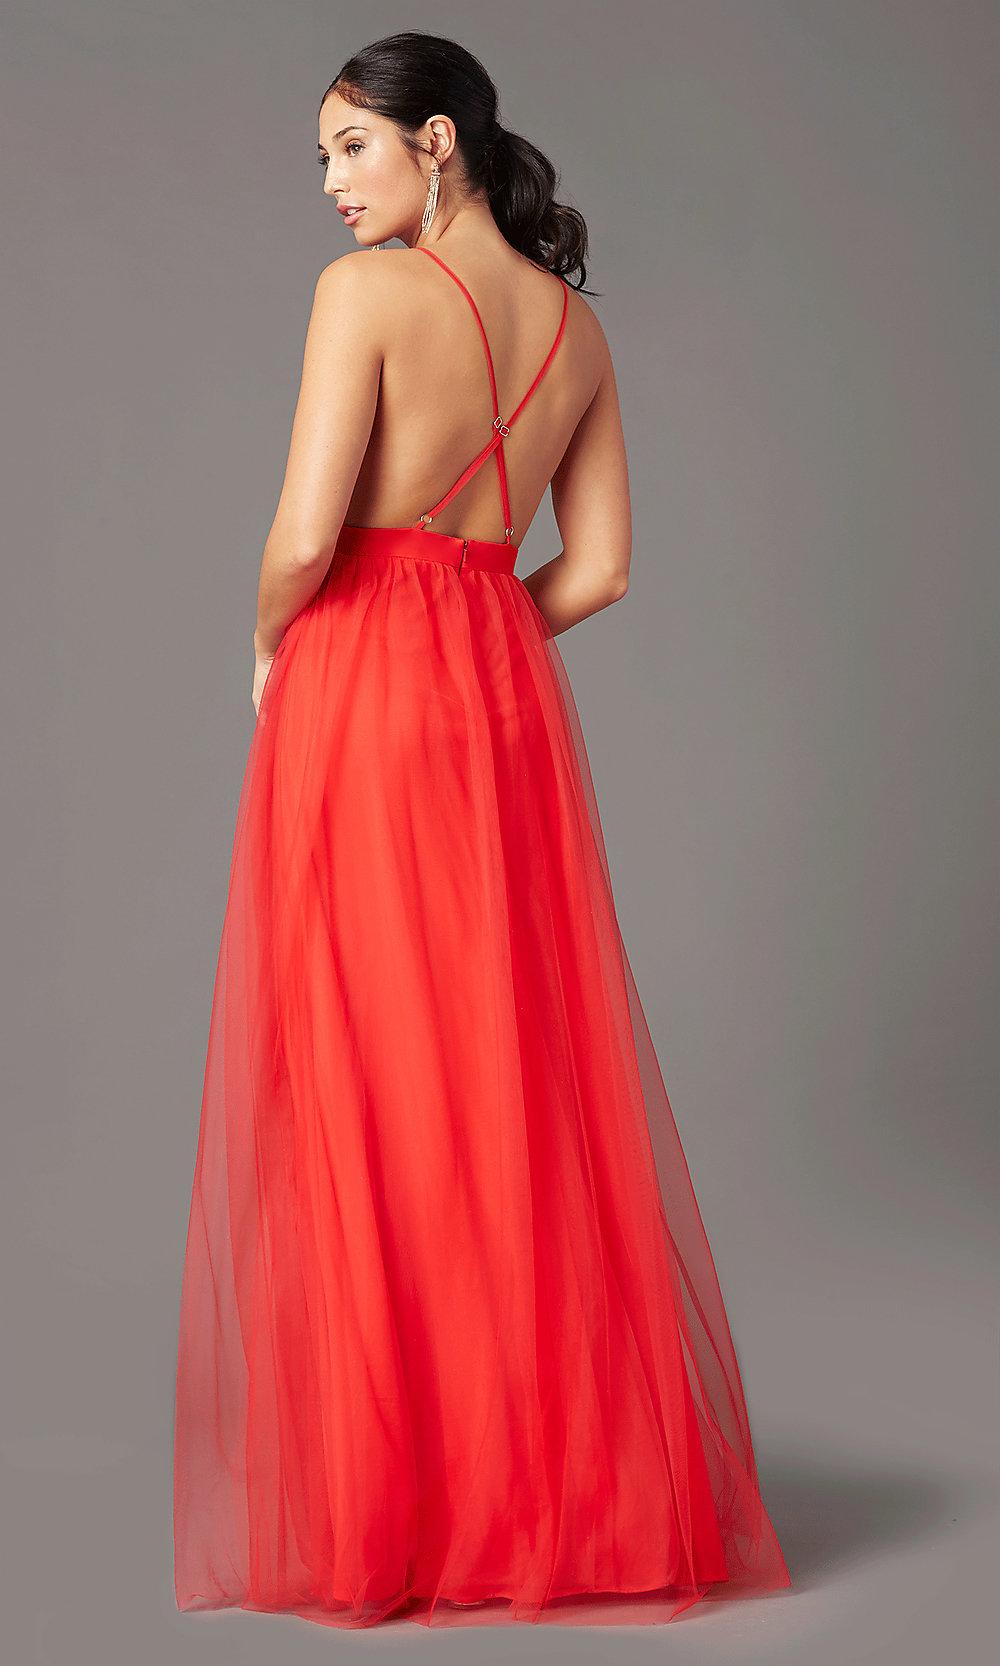 Open back Red prom dress back-side